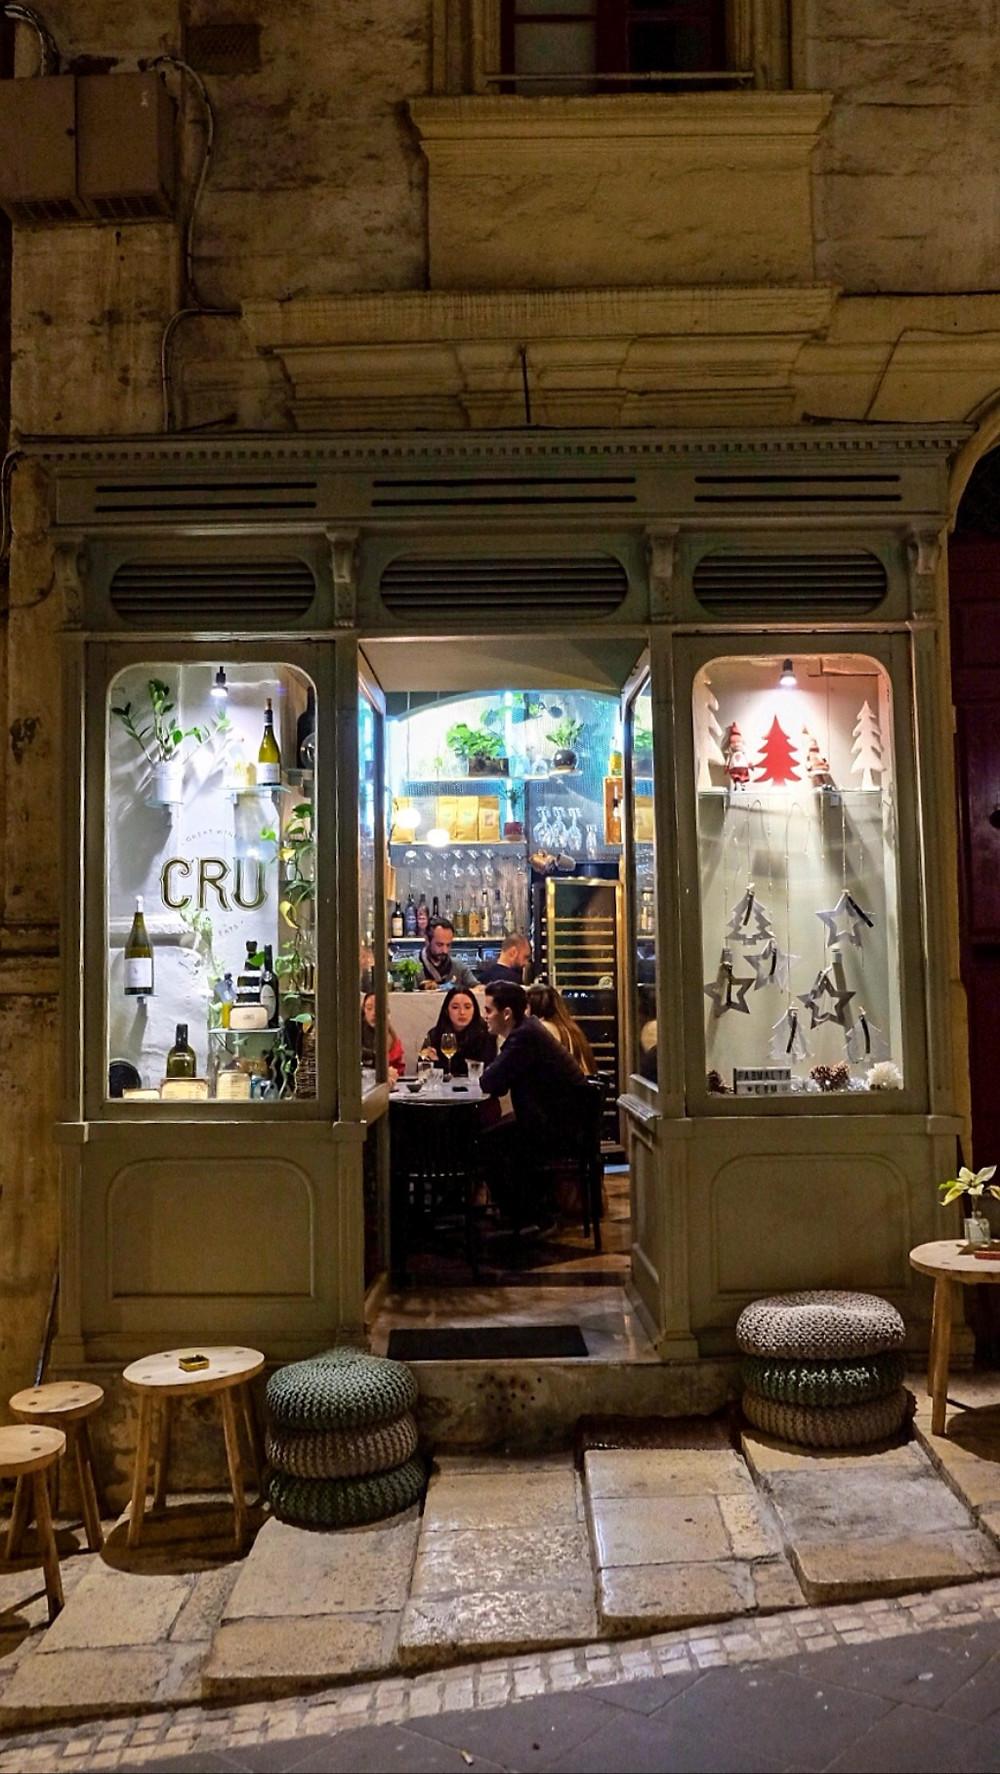 Cru Wine Bar in Valletta Malta